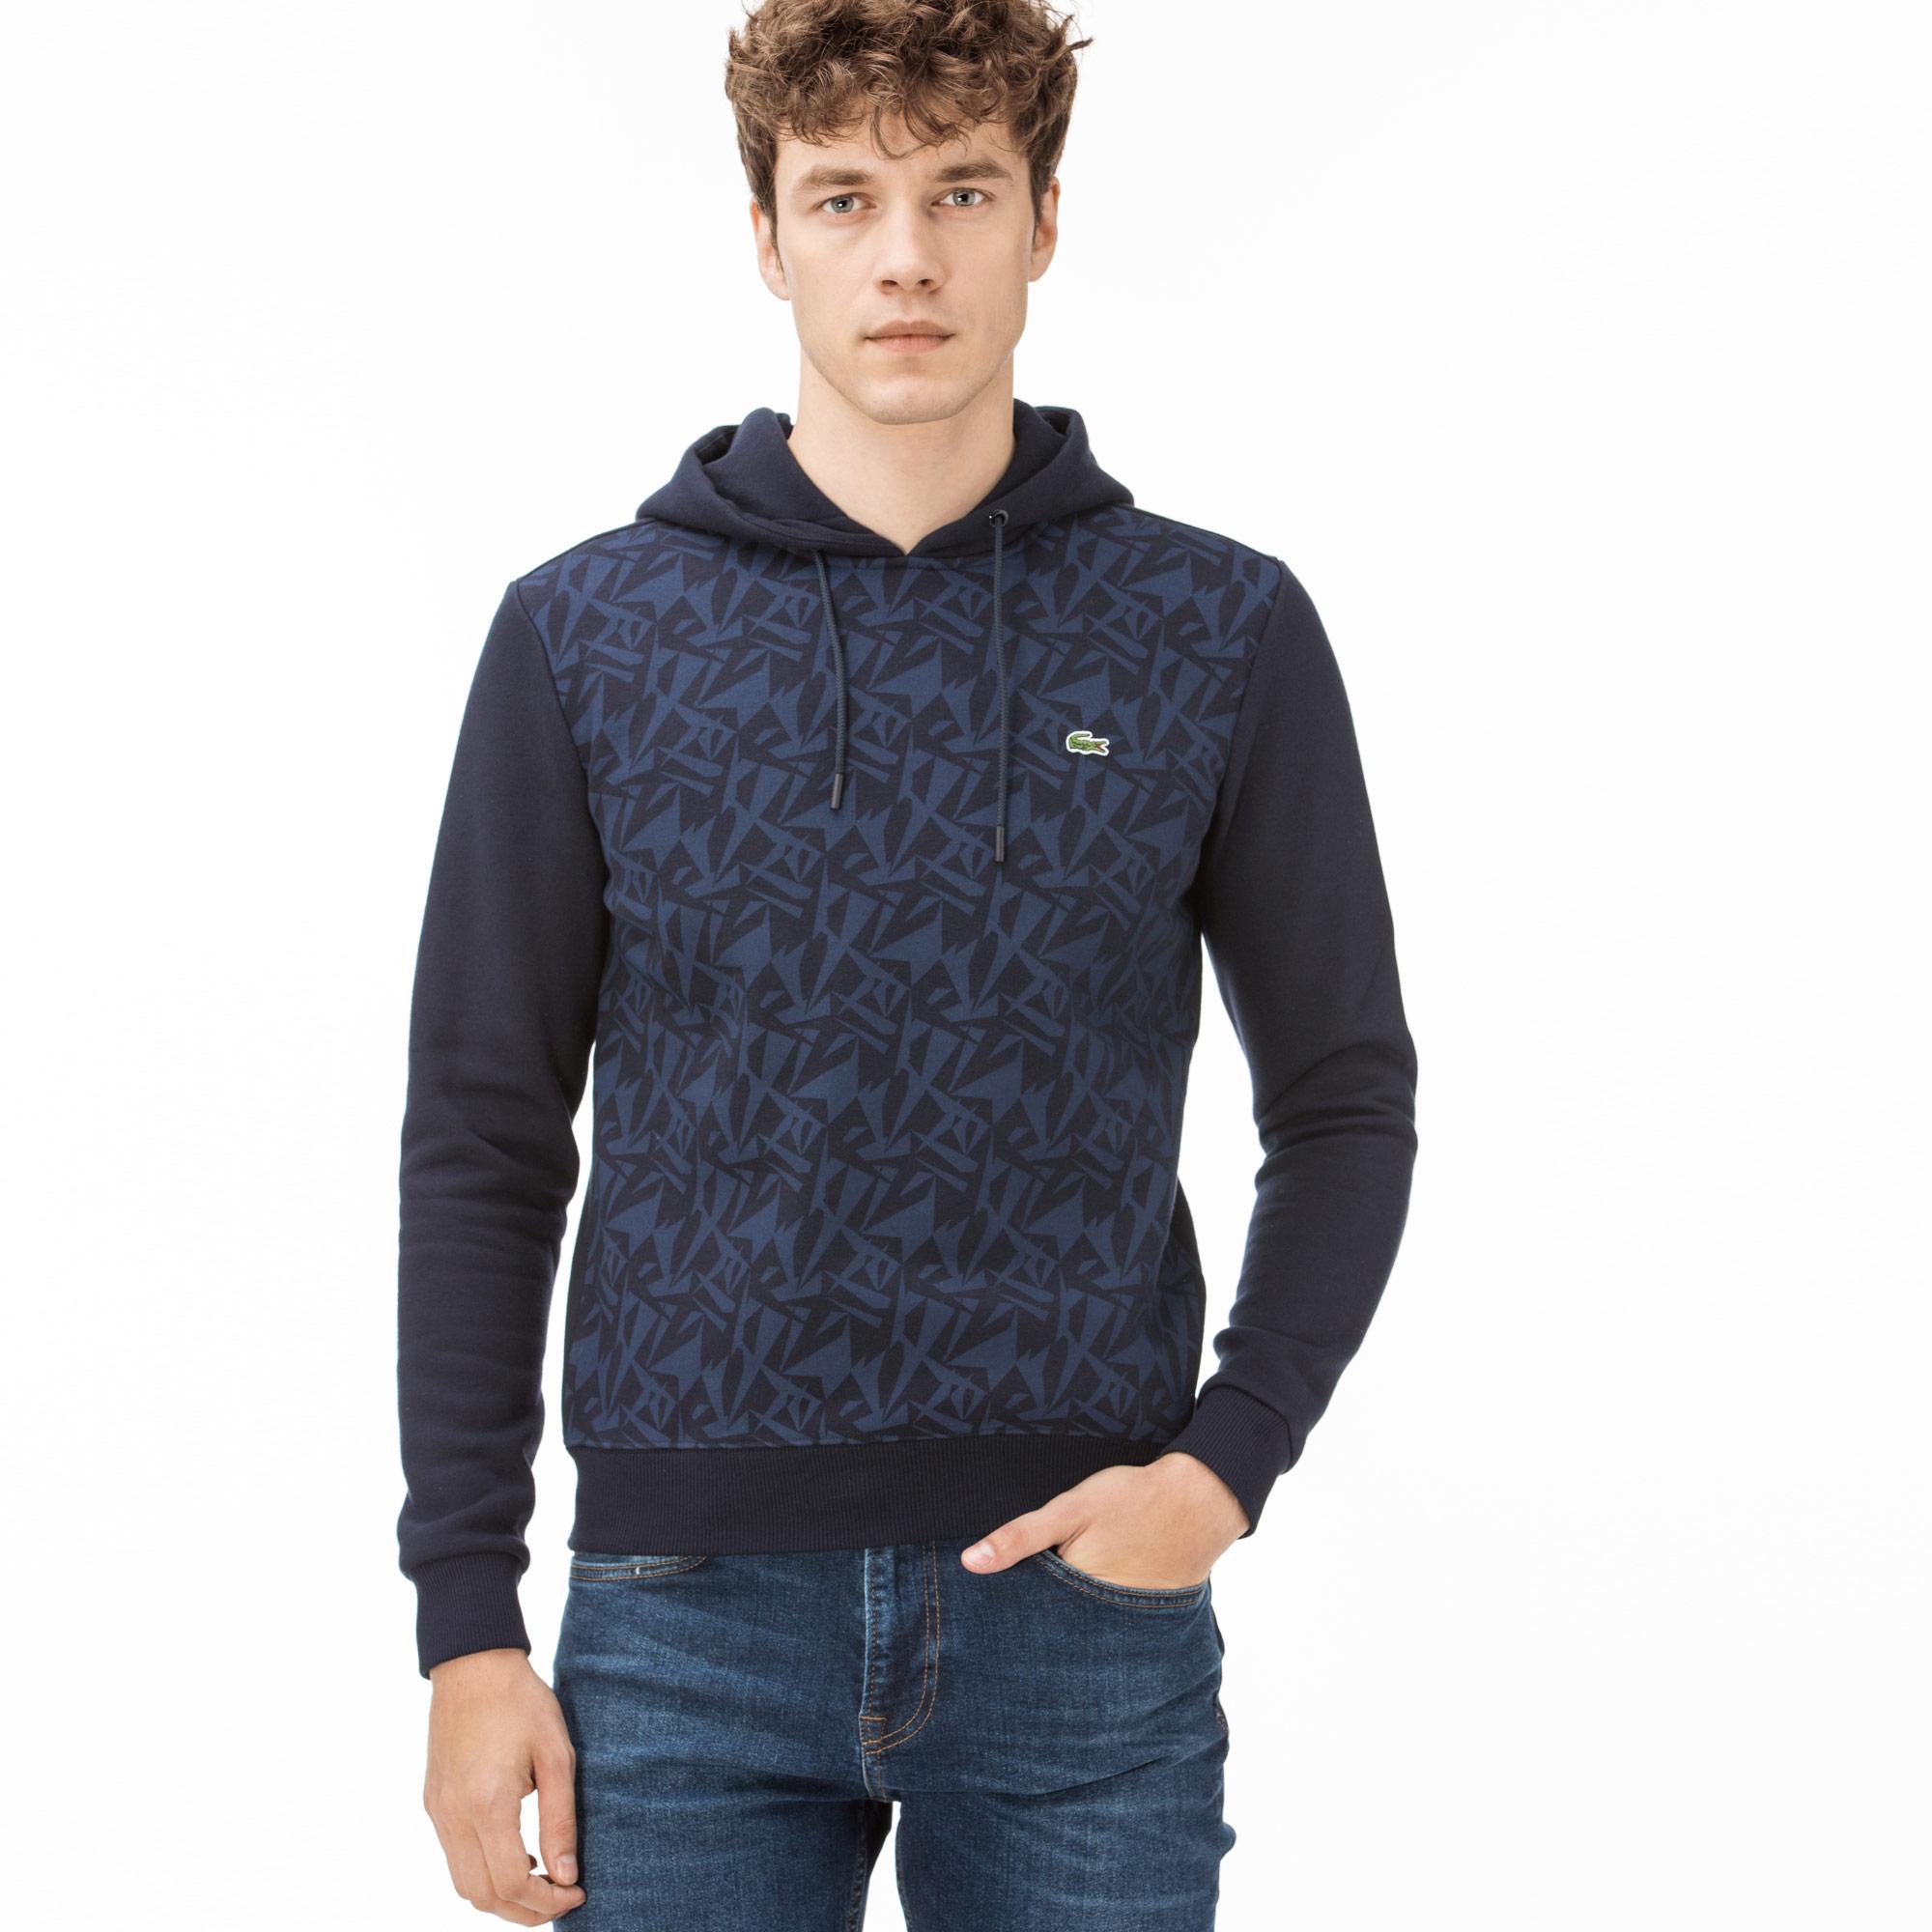 Lacoste Kapüşonlu Erkek Lacivert Sweatshirt